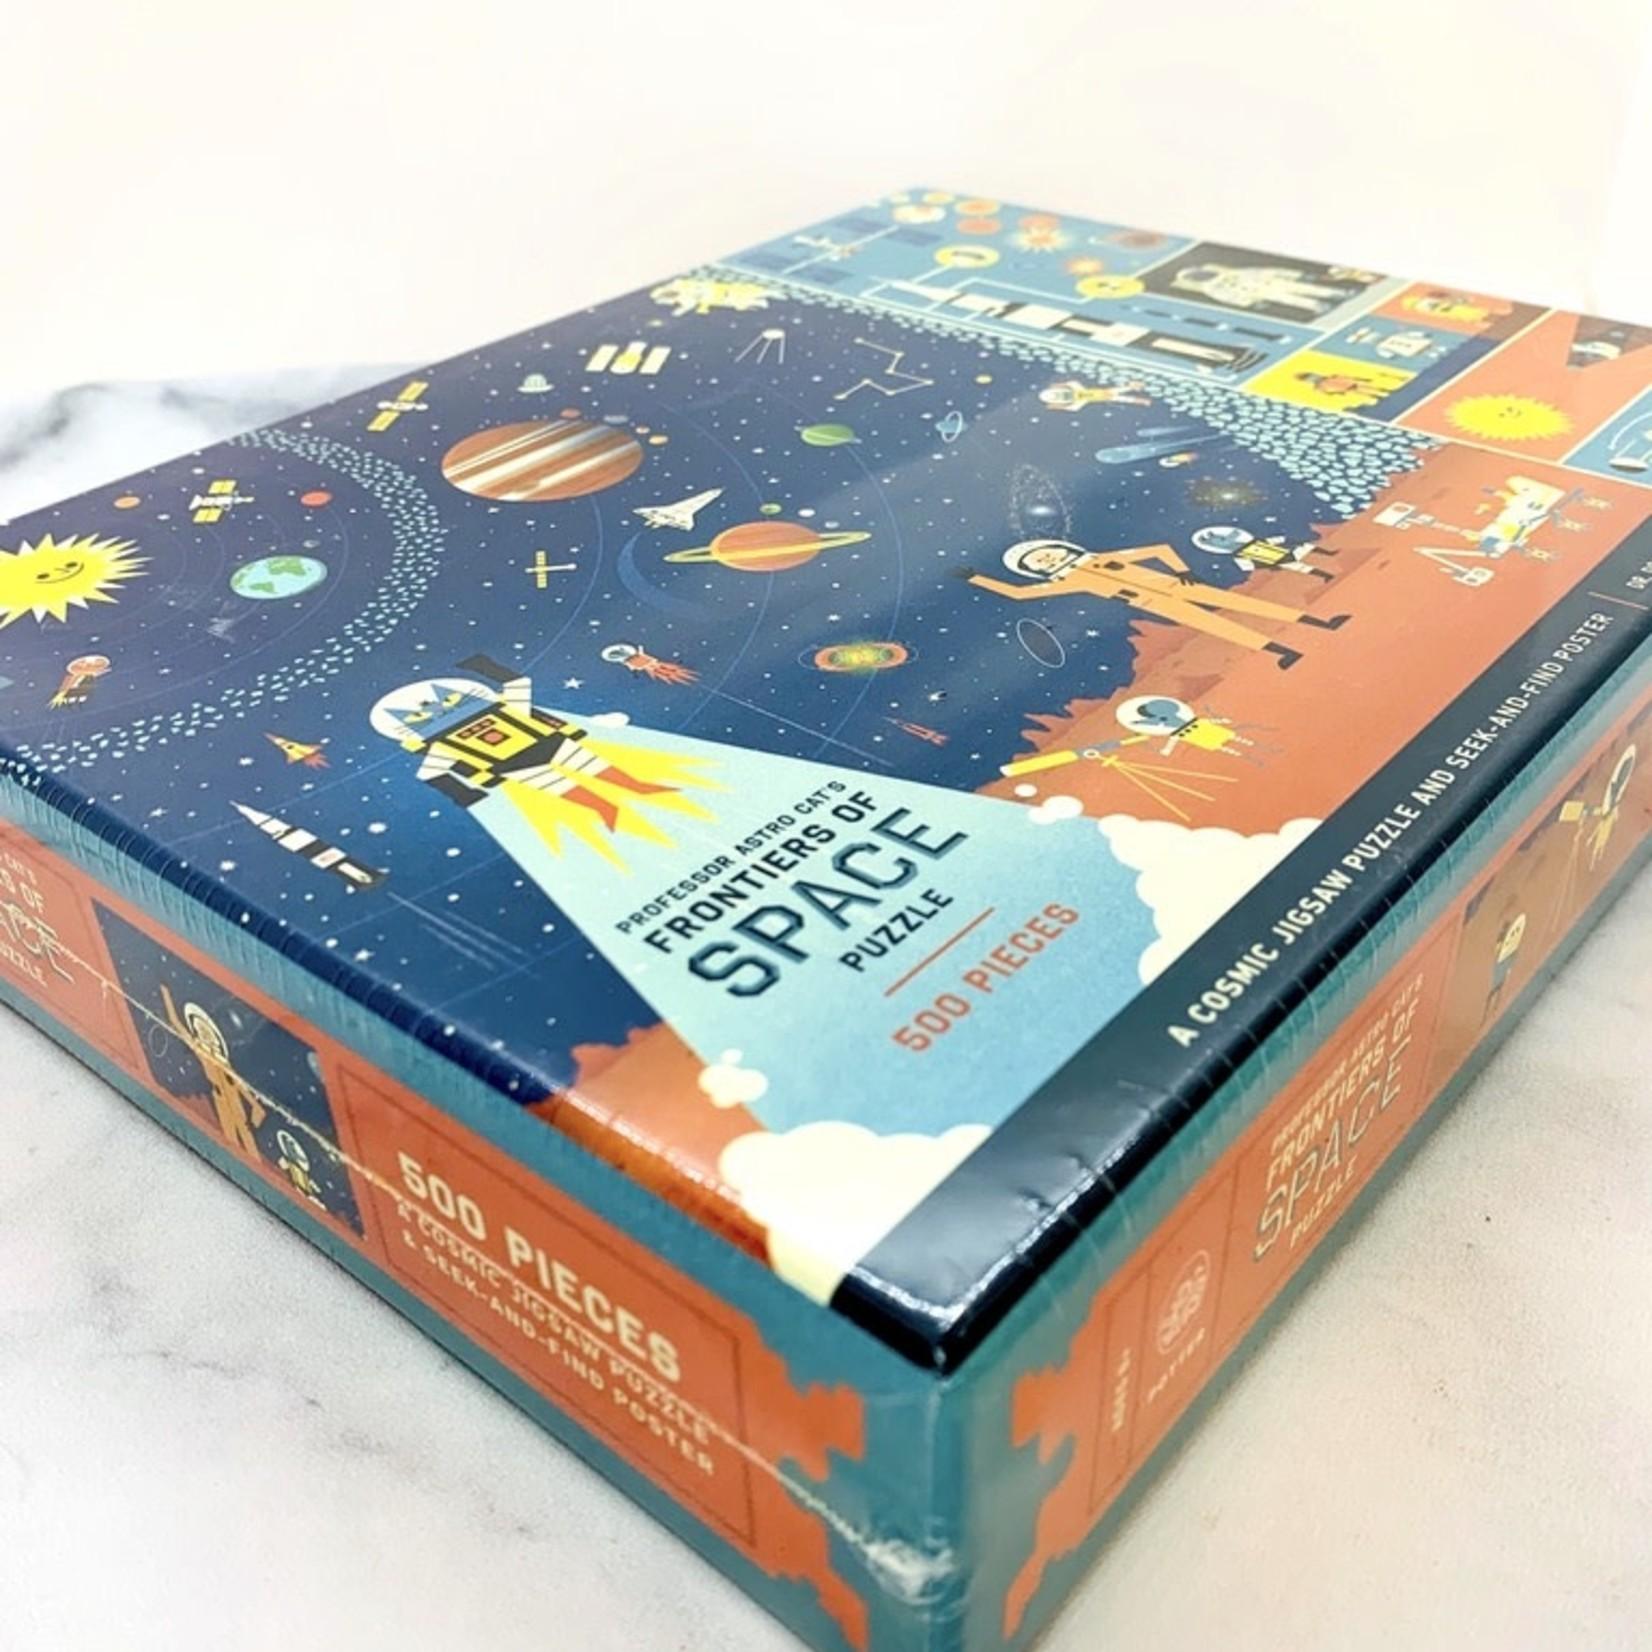 Professor Astro Cat's Frontiers of Space 500 Piece Puzzle